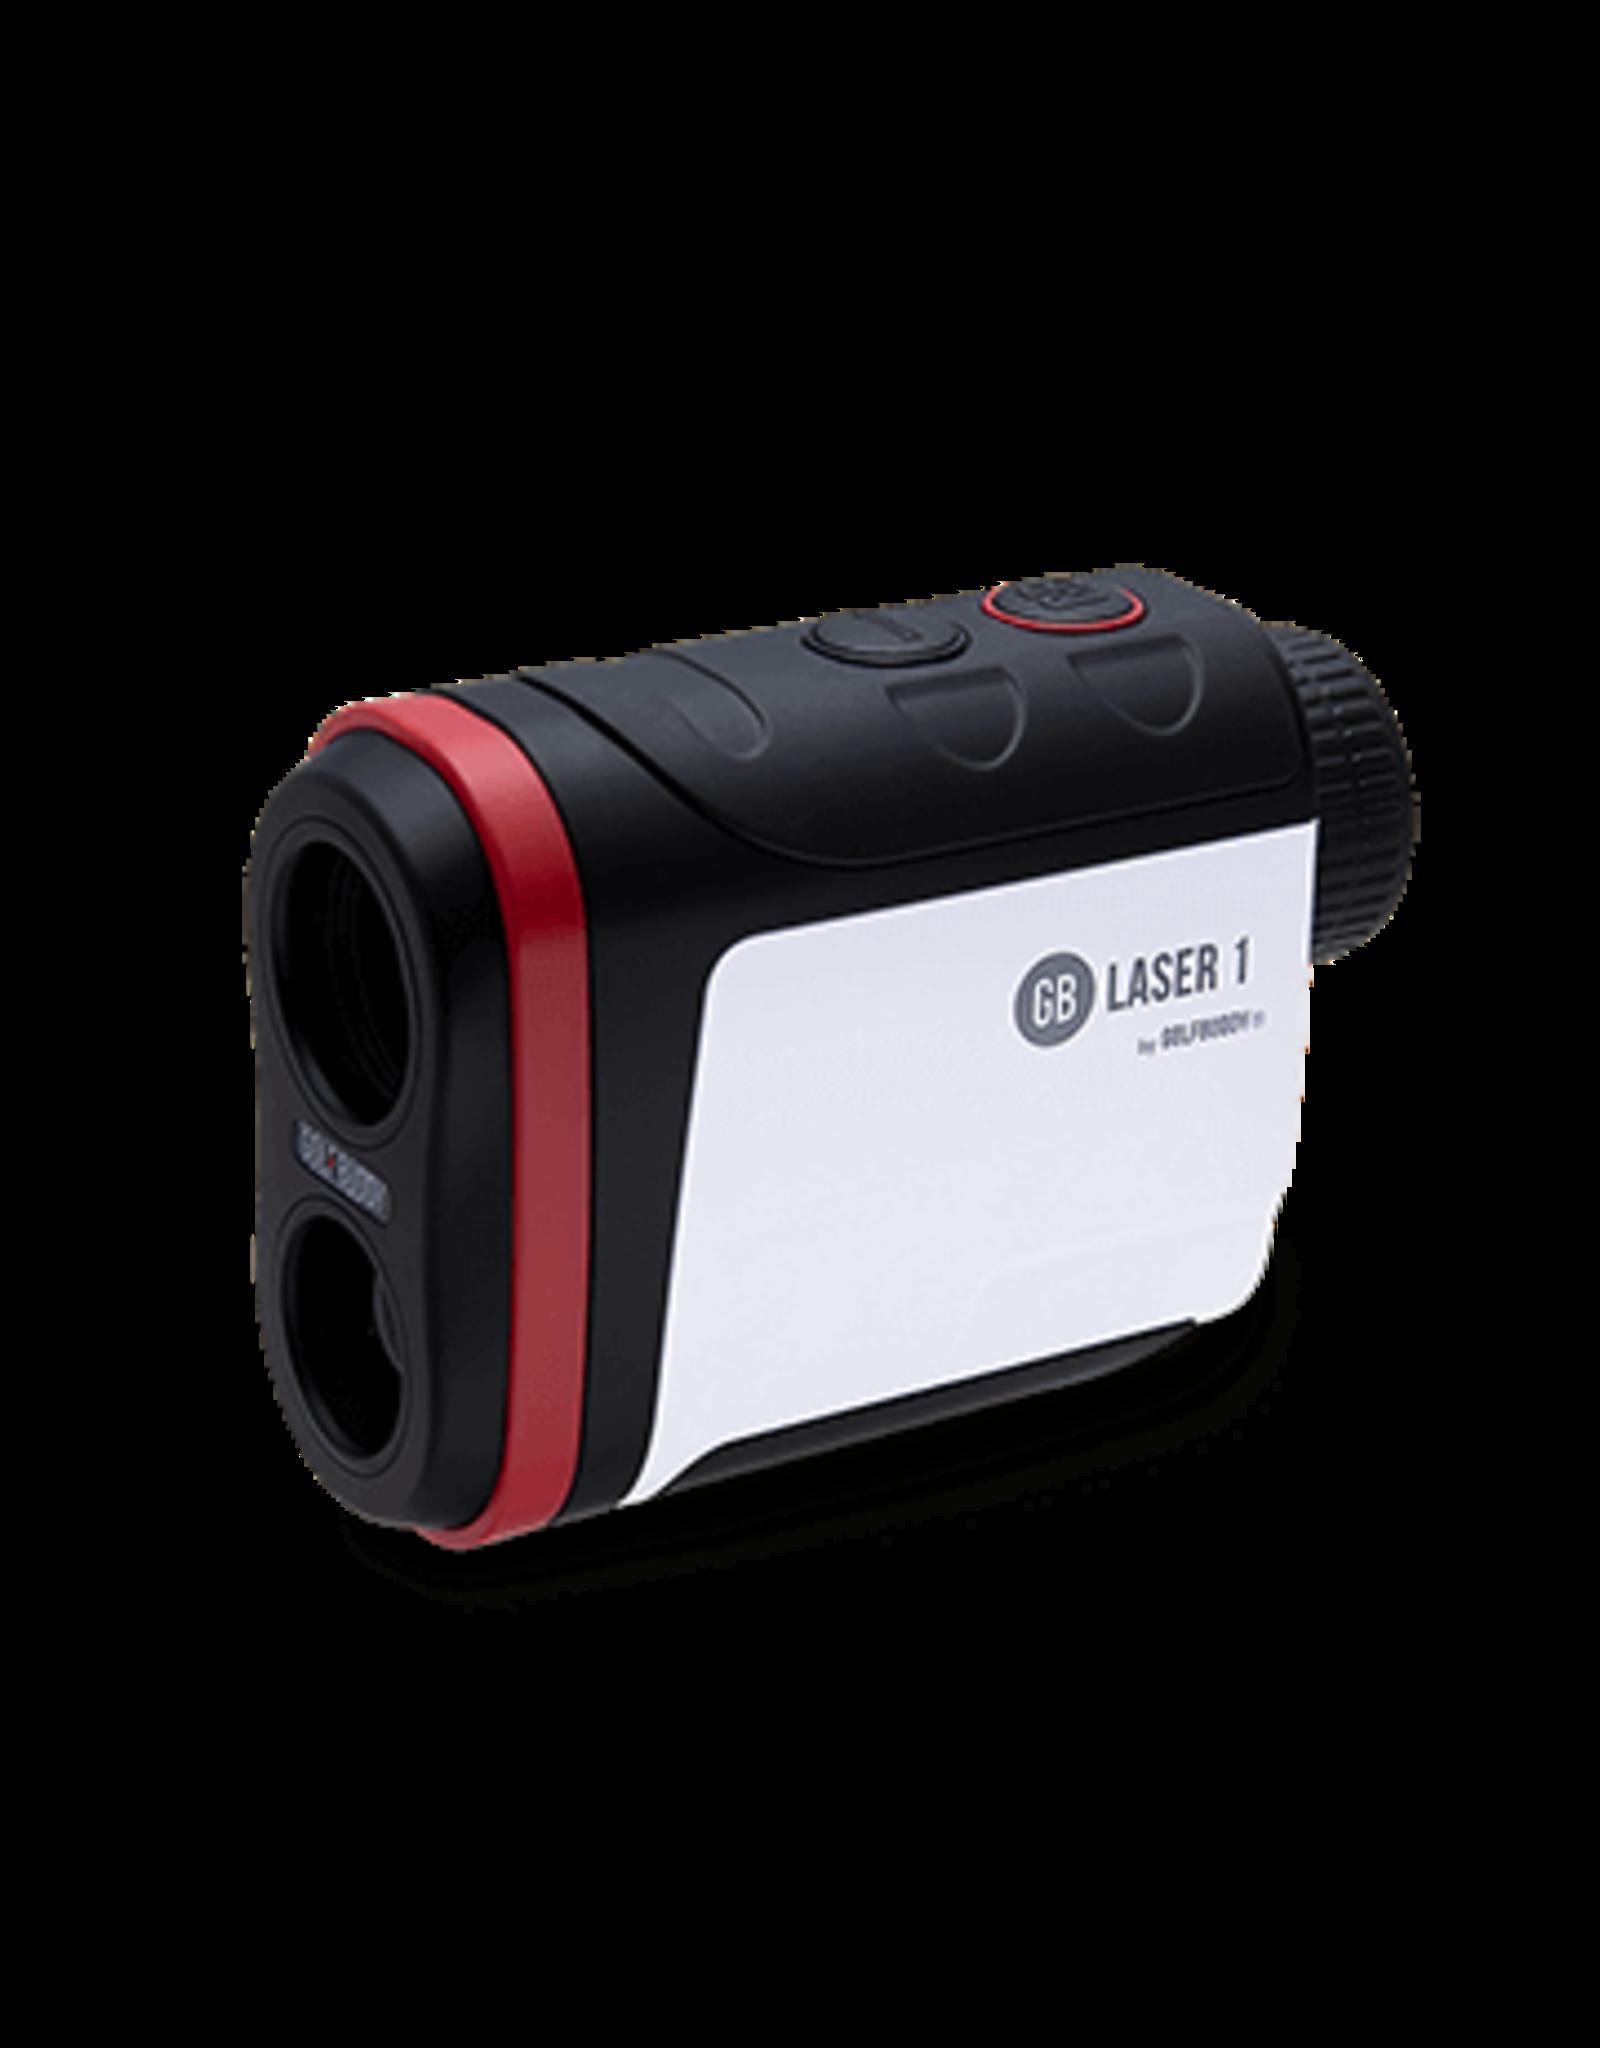 Golf Buddy Golf Buddy Laser 1 Rangefinder